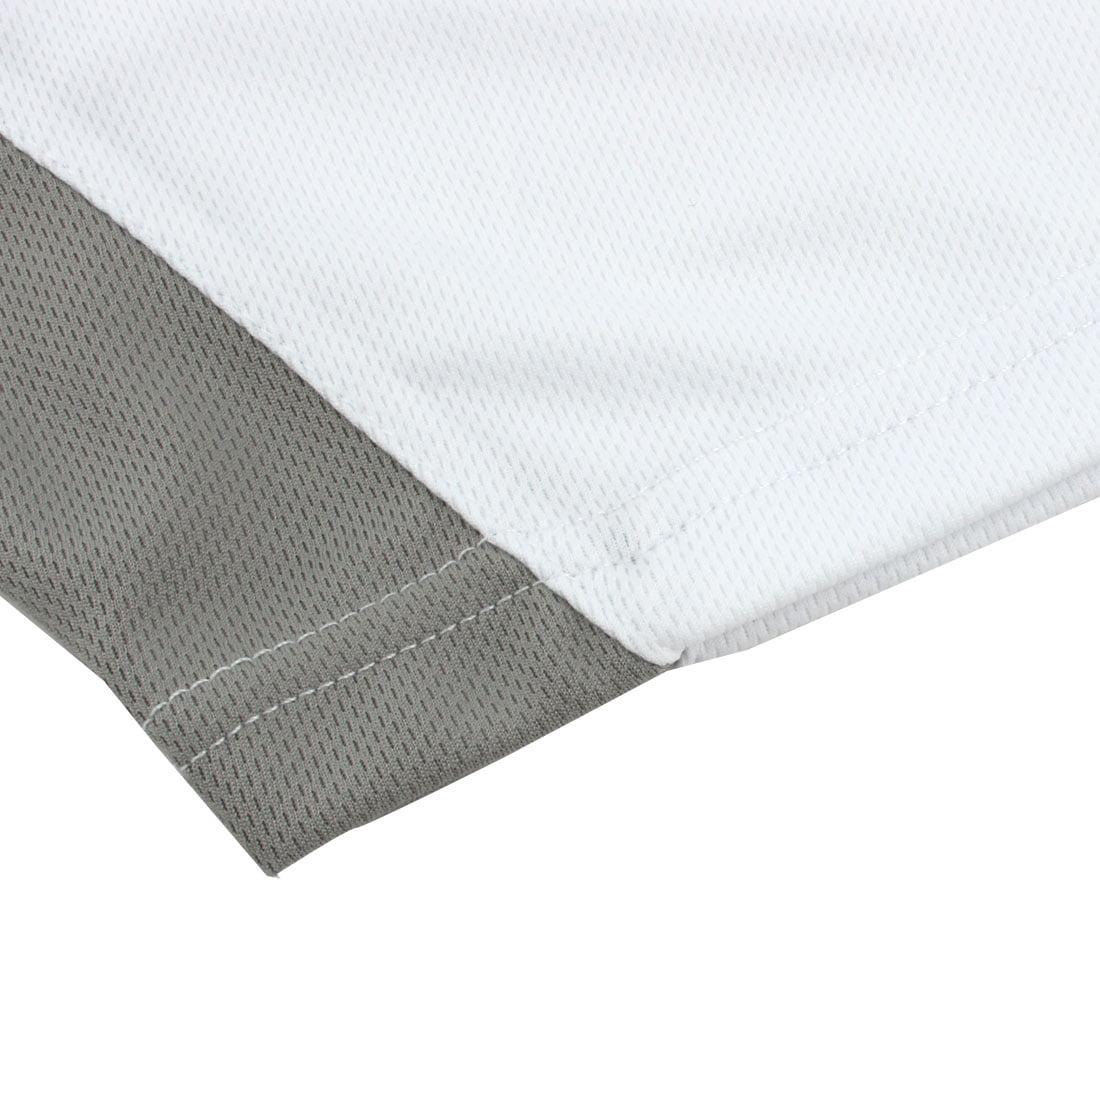 Men Exercise Marathon Polyester Short Sleeve Sports T-shirt White L/L (US 42) - image 1 de 6